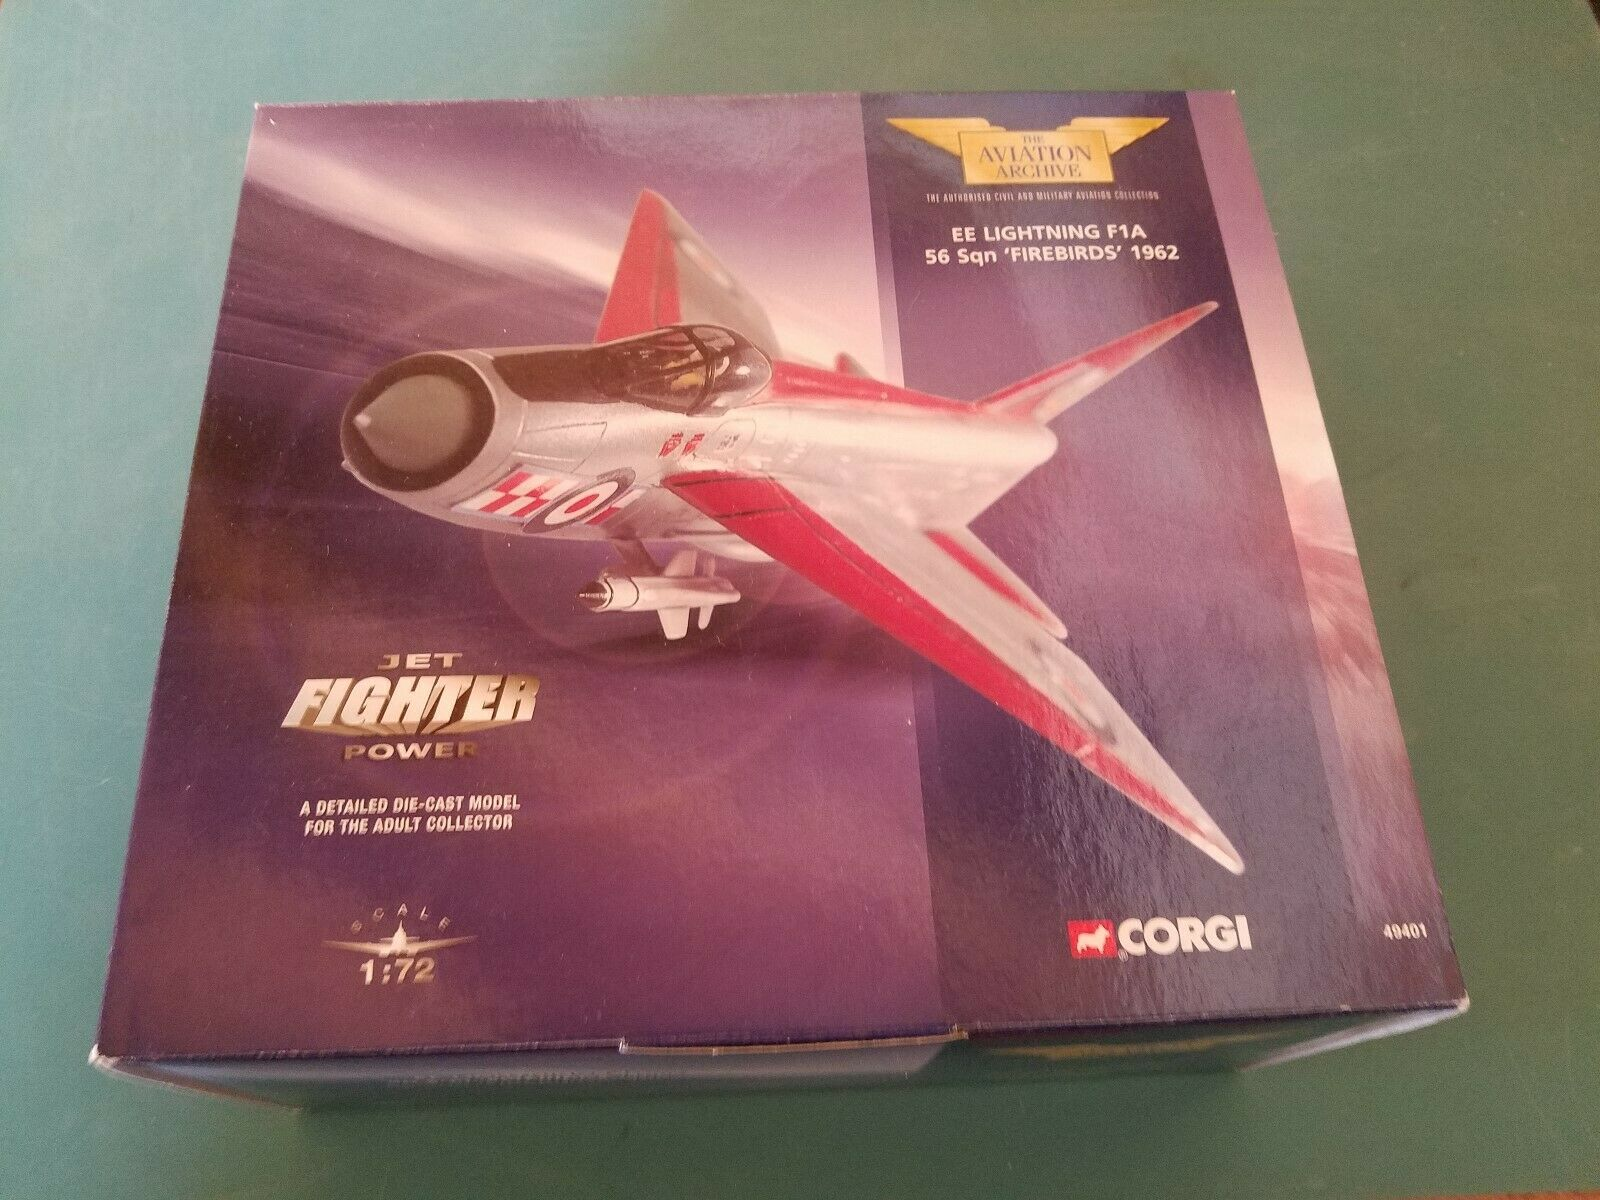 Corgi 49401 EE ljusning F1A 56 Sqn Firebirds 1962